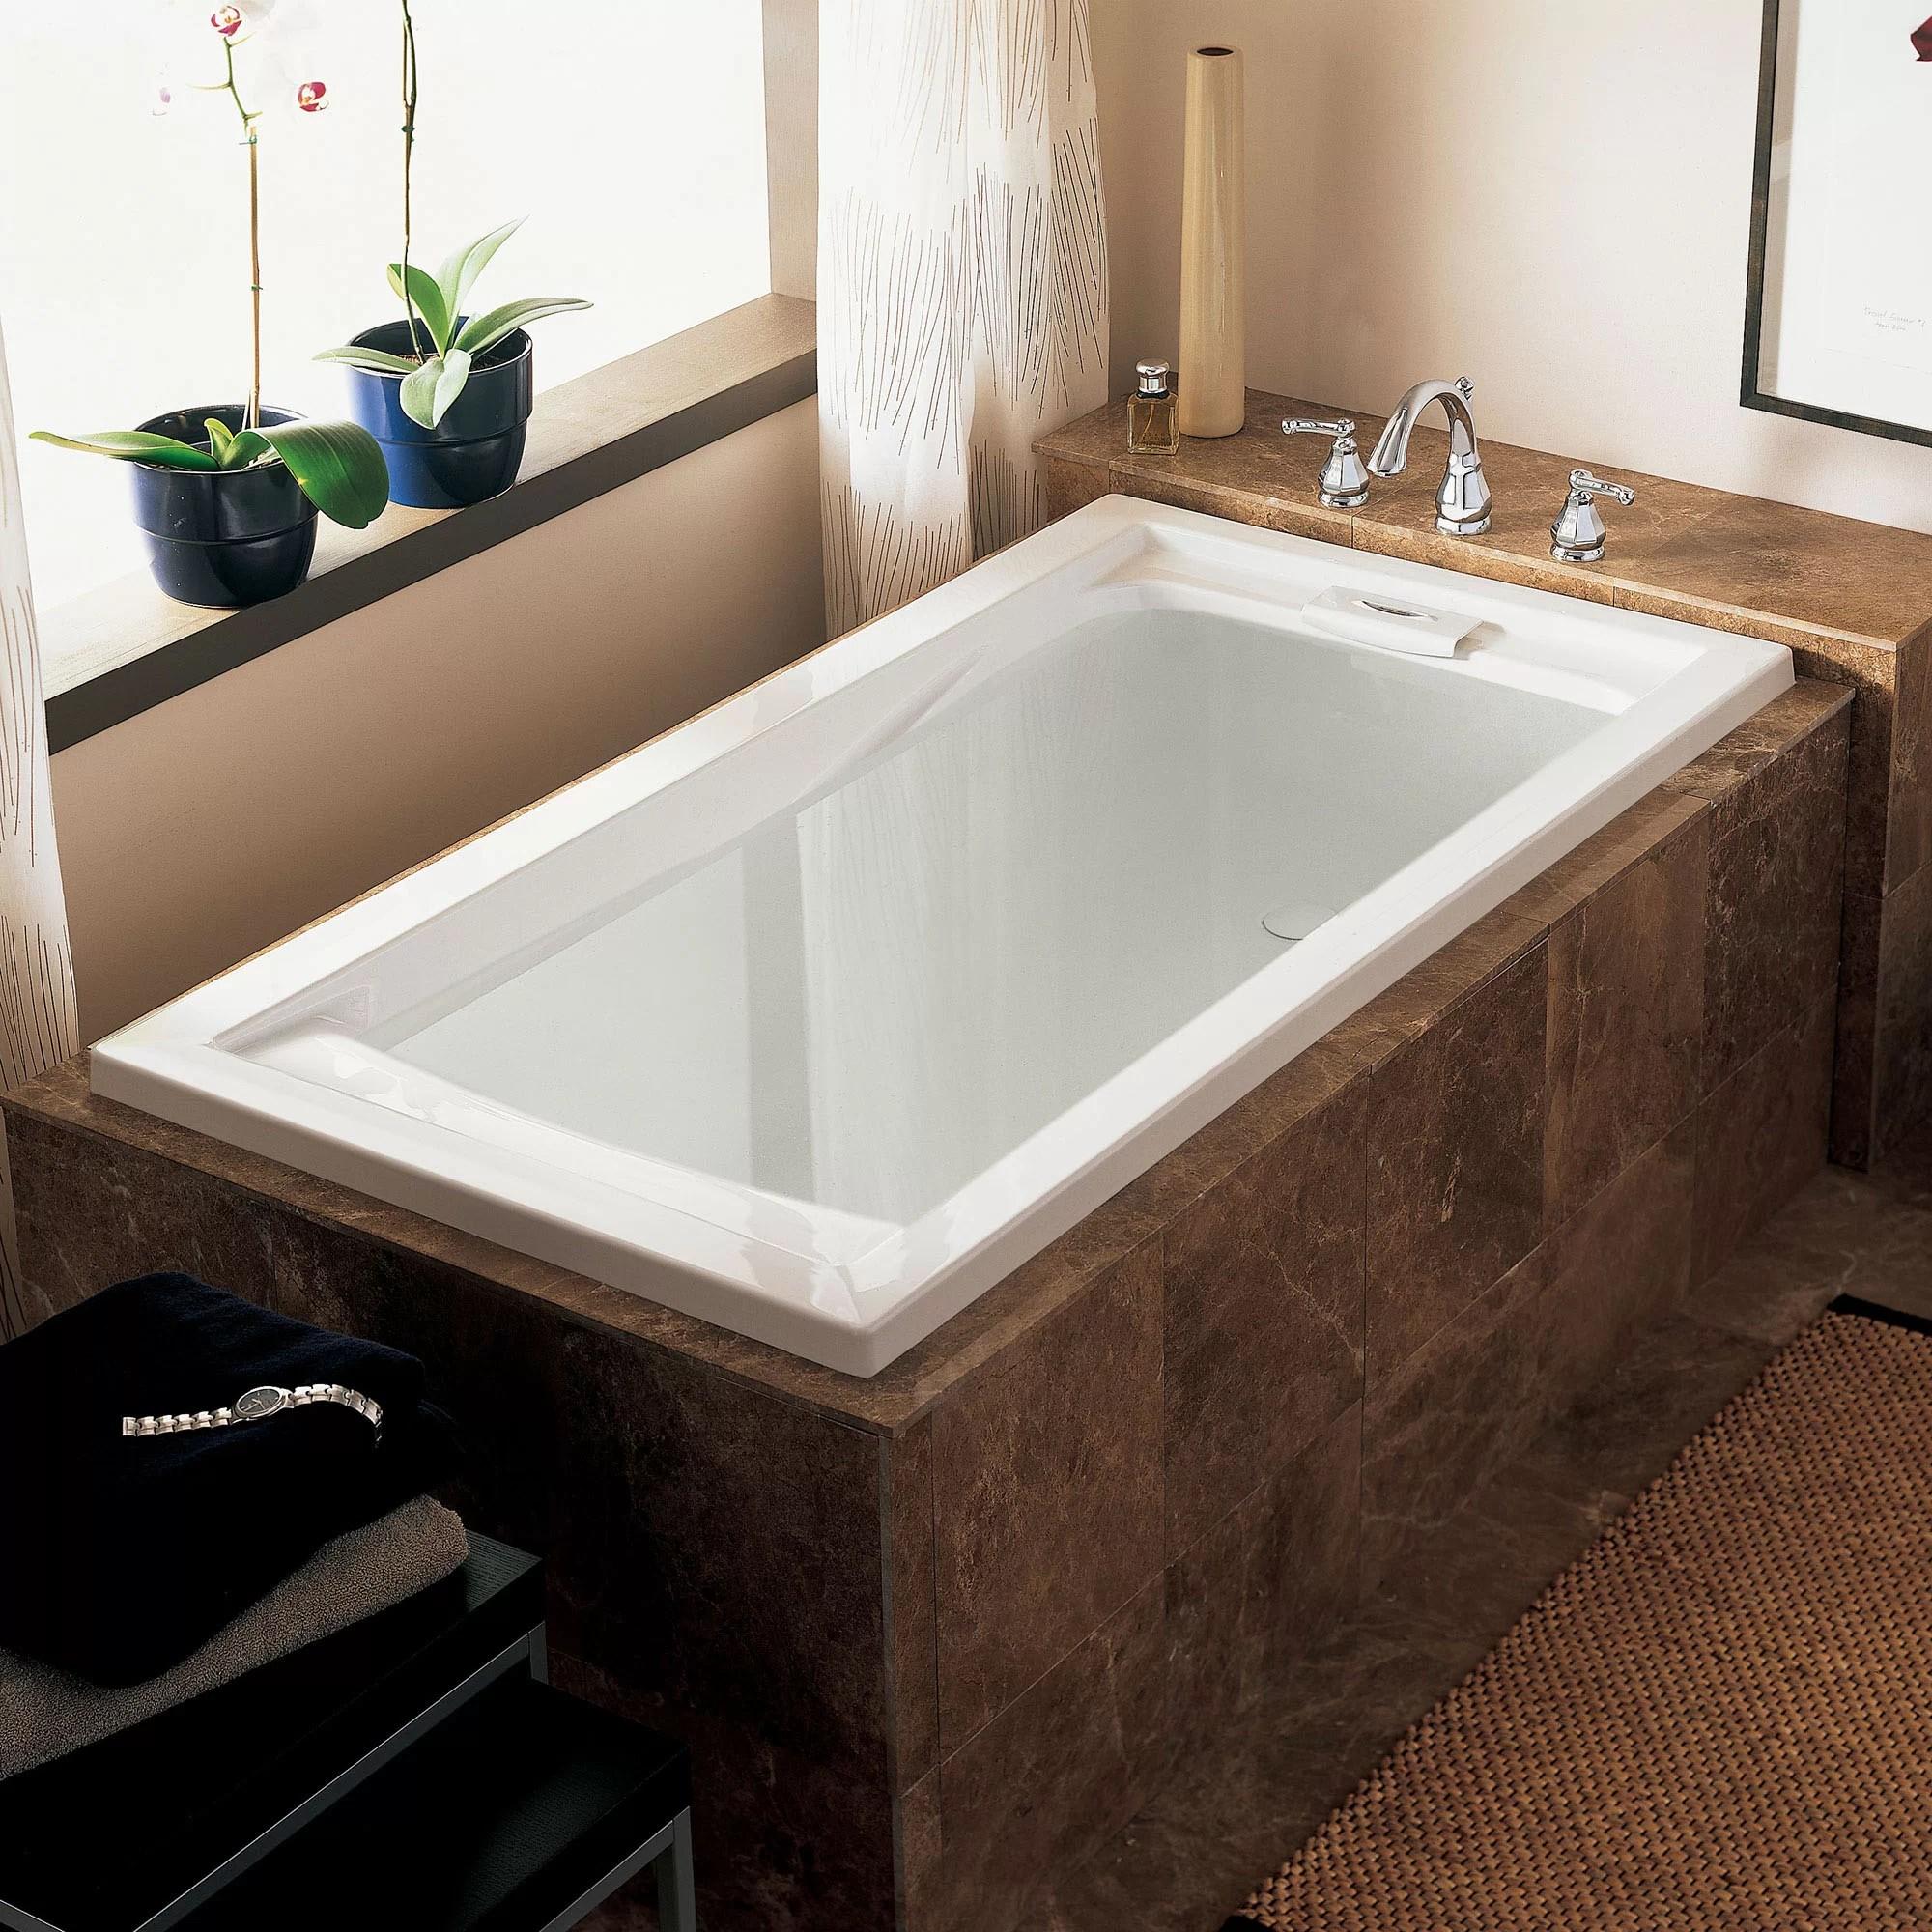 American Standard Evolution 60 X 32 Drop In Whirlpool Bathtub Wayfair